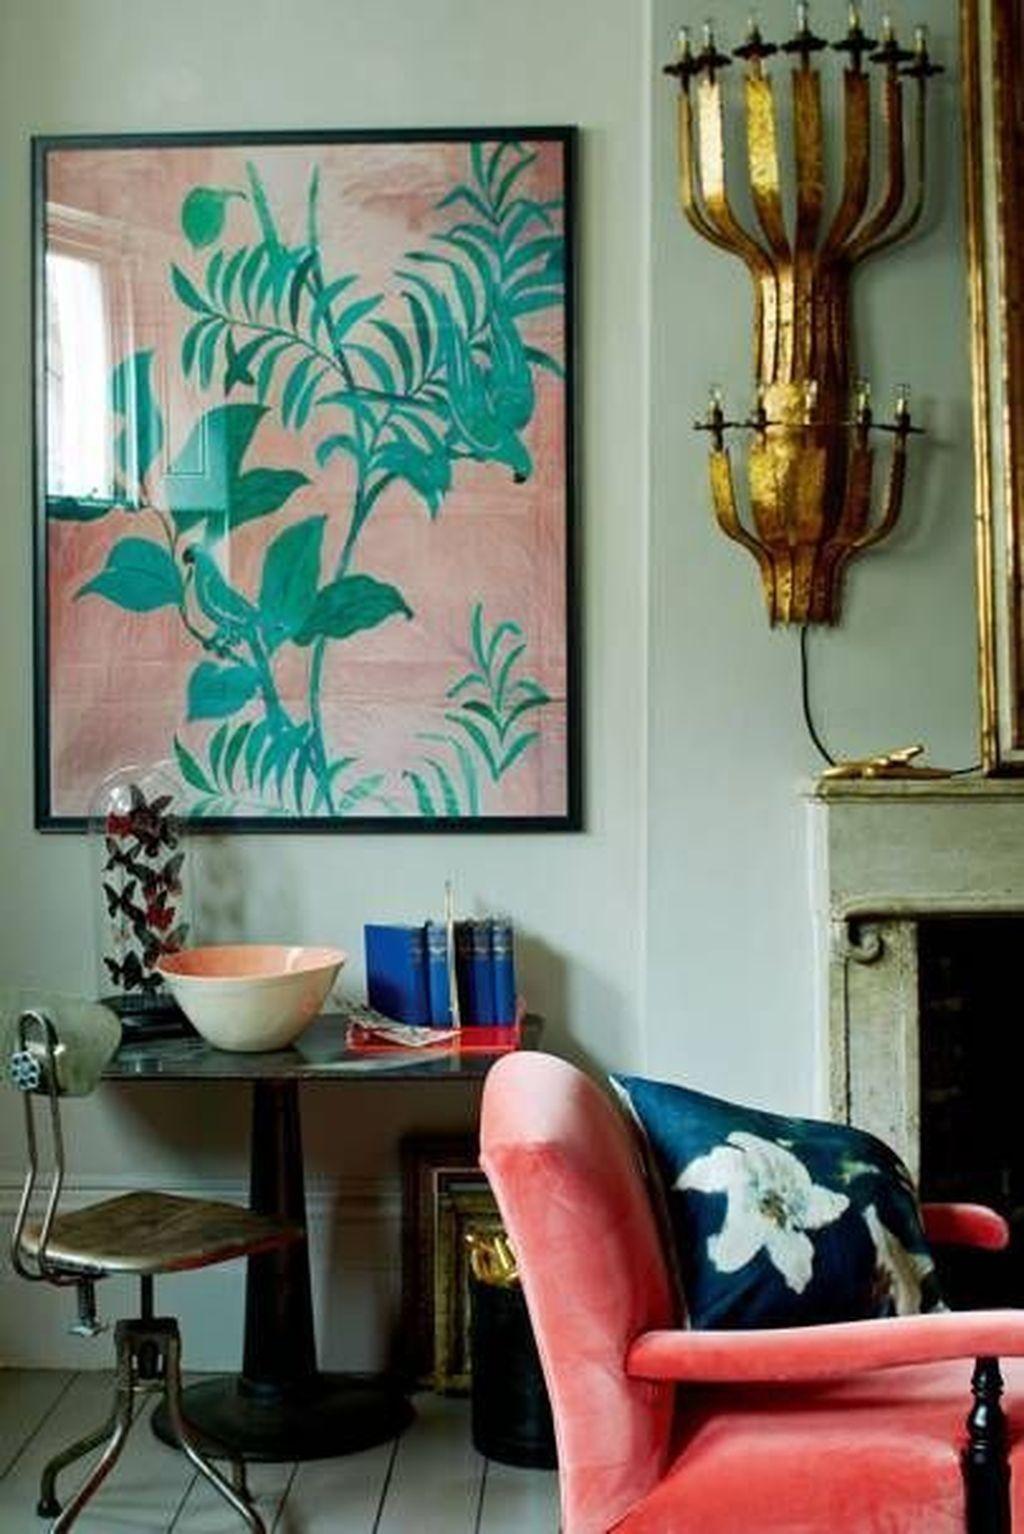 41 Cheap Summer Decor Ideas For Your Apartment apartment #41 #cheap #summer #decor #ideas #for #your #apartment